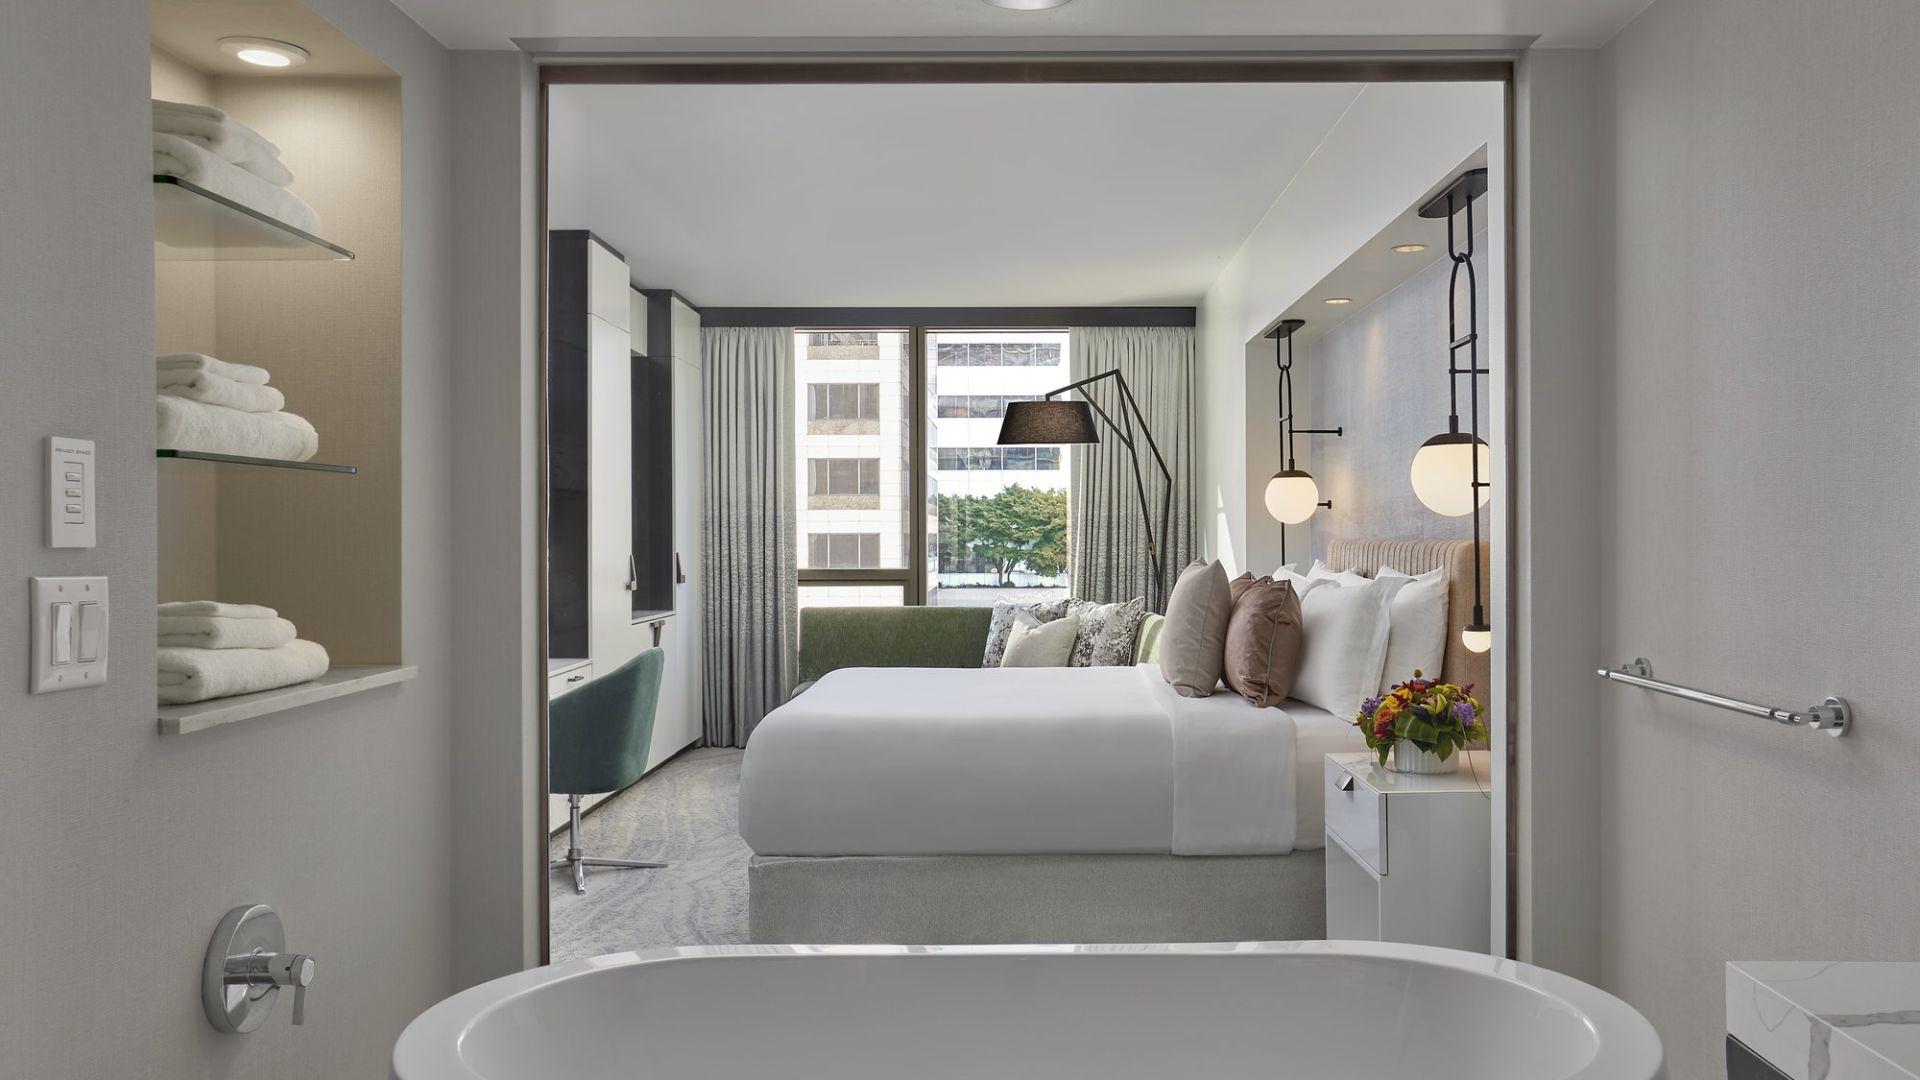 Waterfront Hotel Rooms In Seattle Loews Hotel 1000